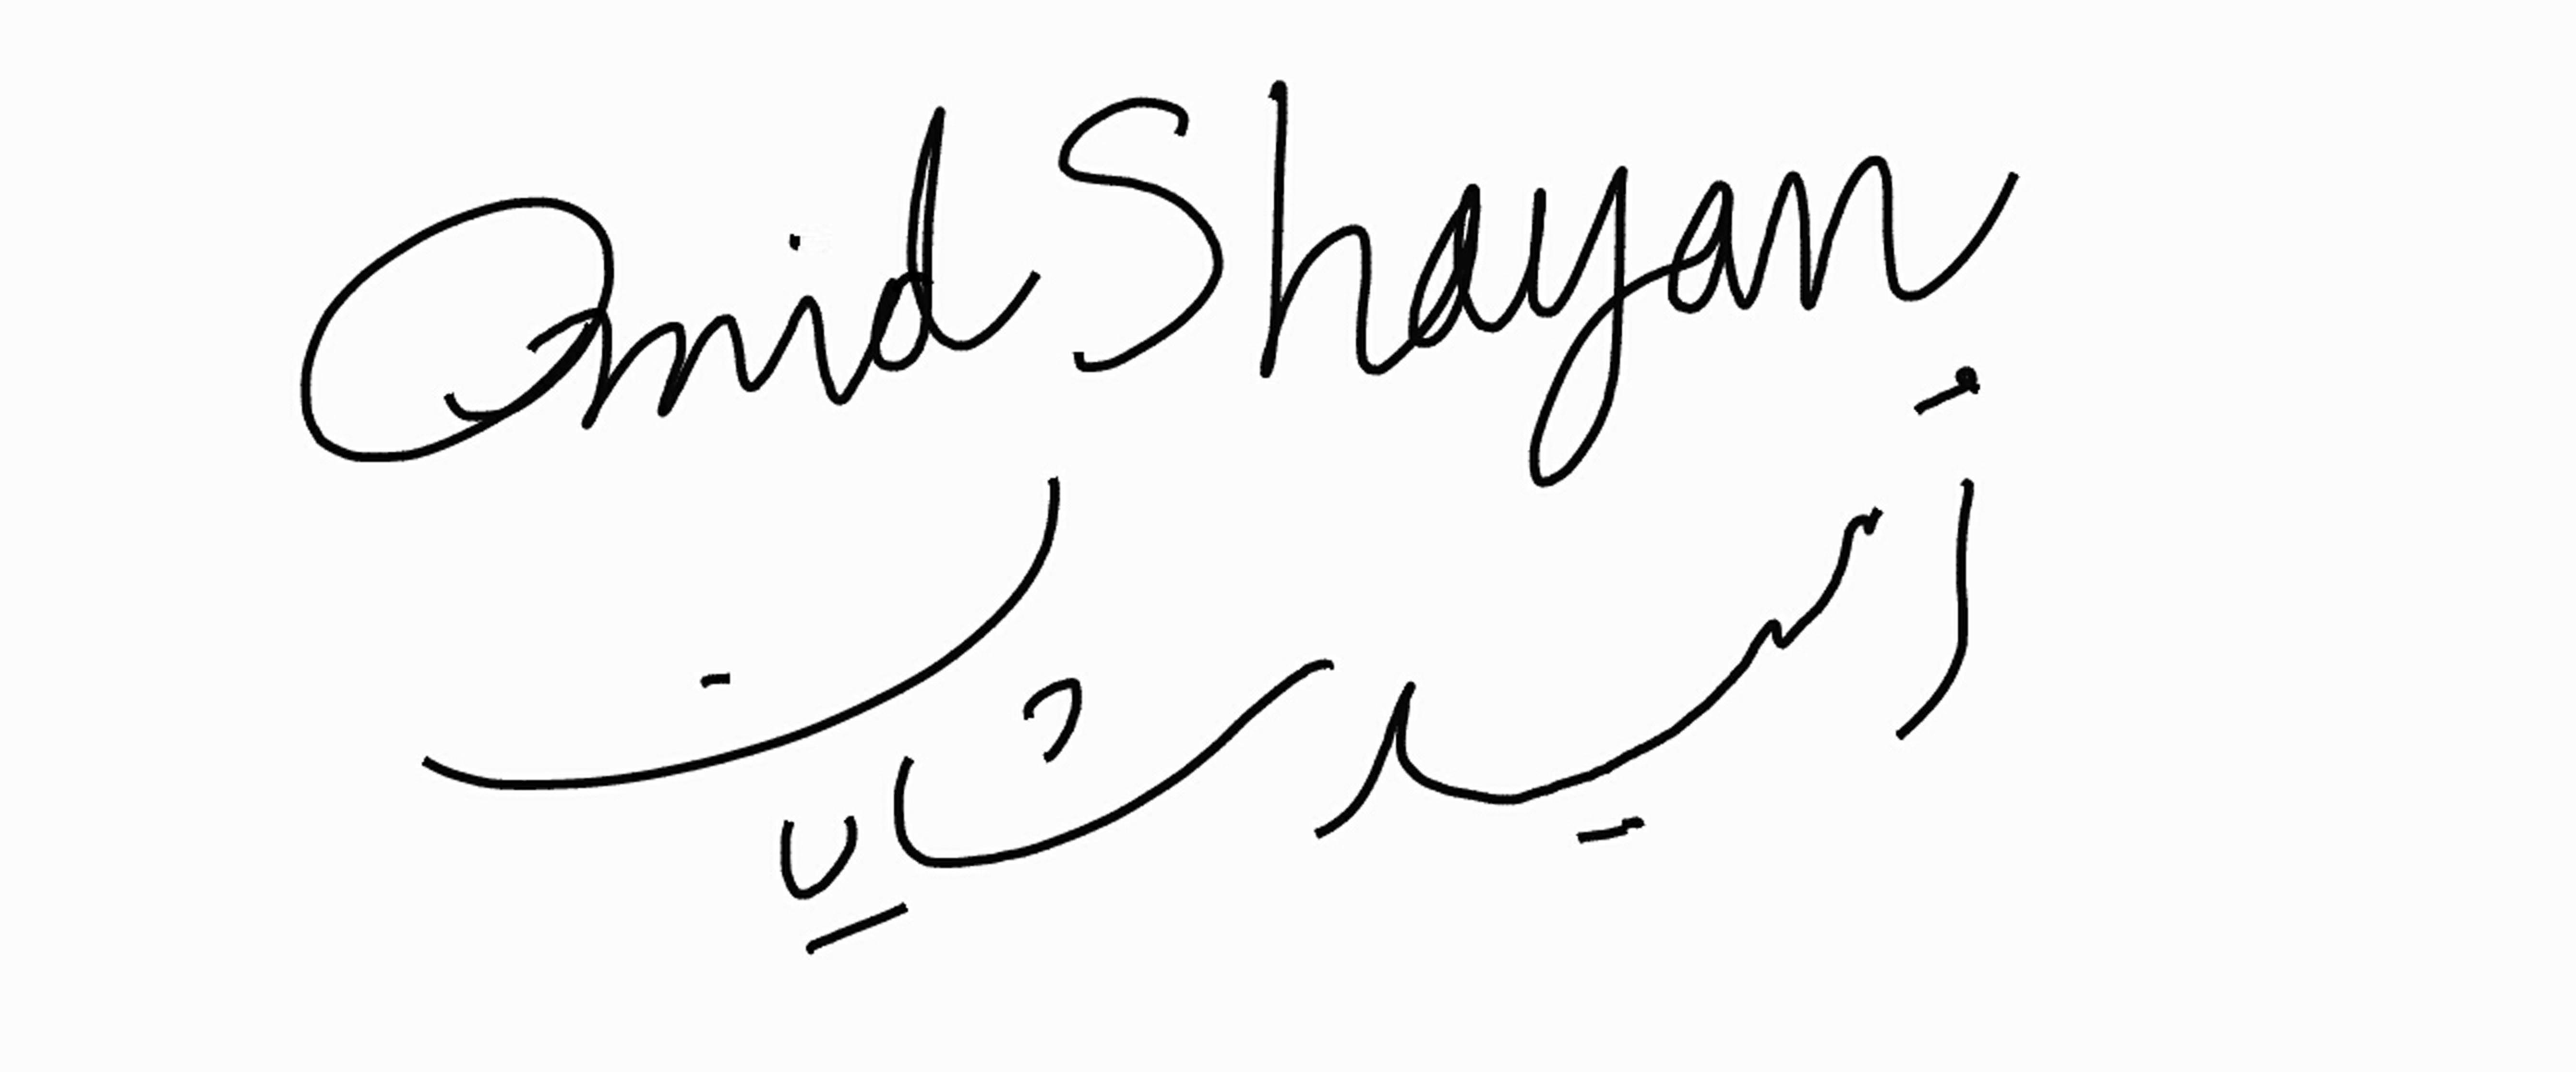 Omid Shayan's Signature